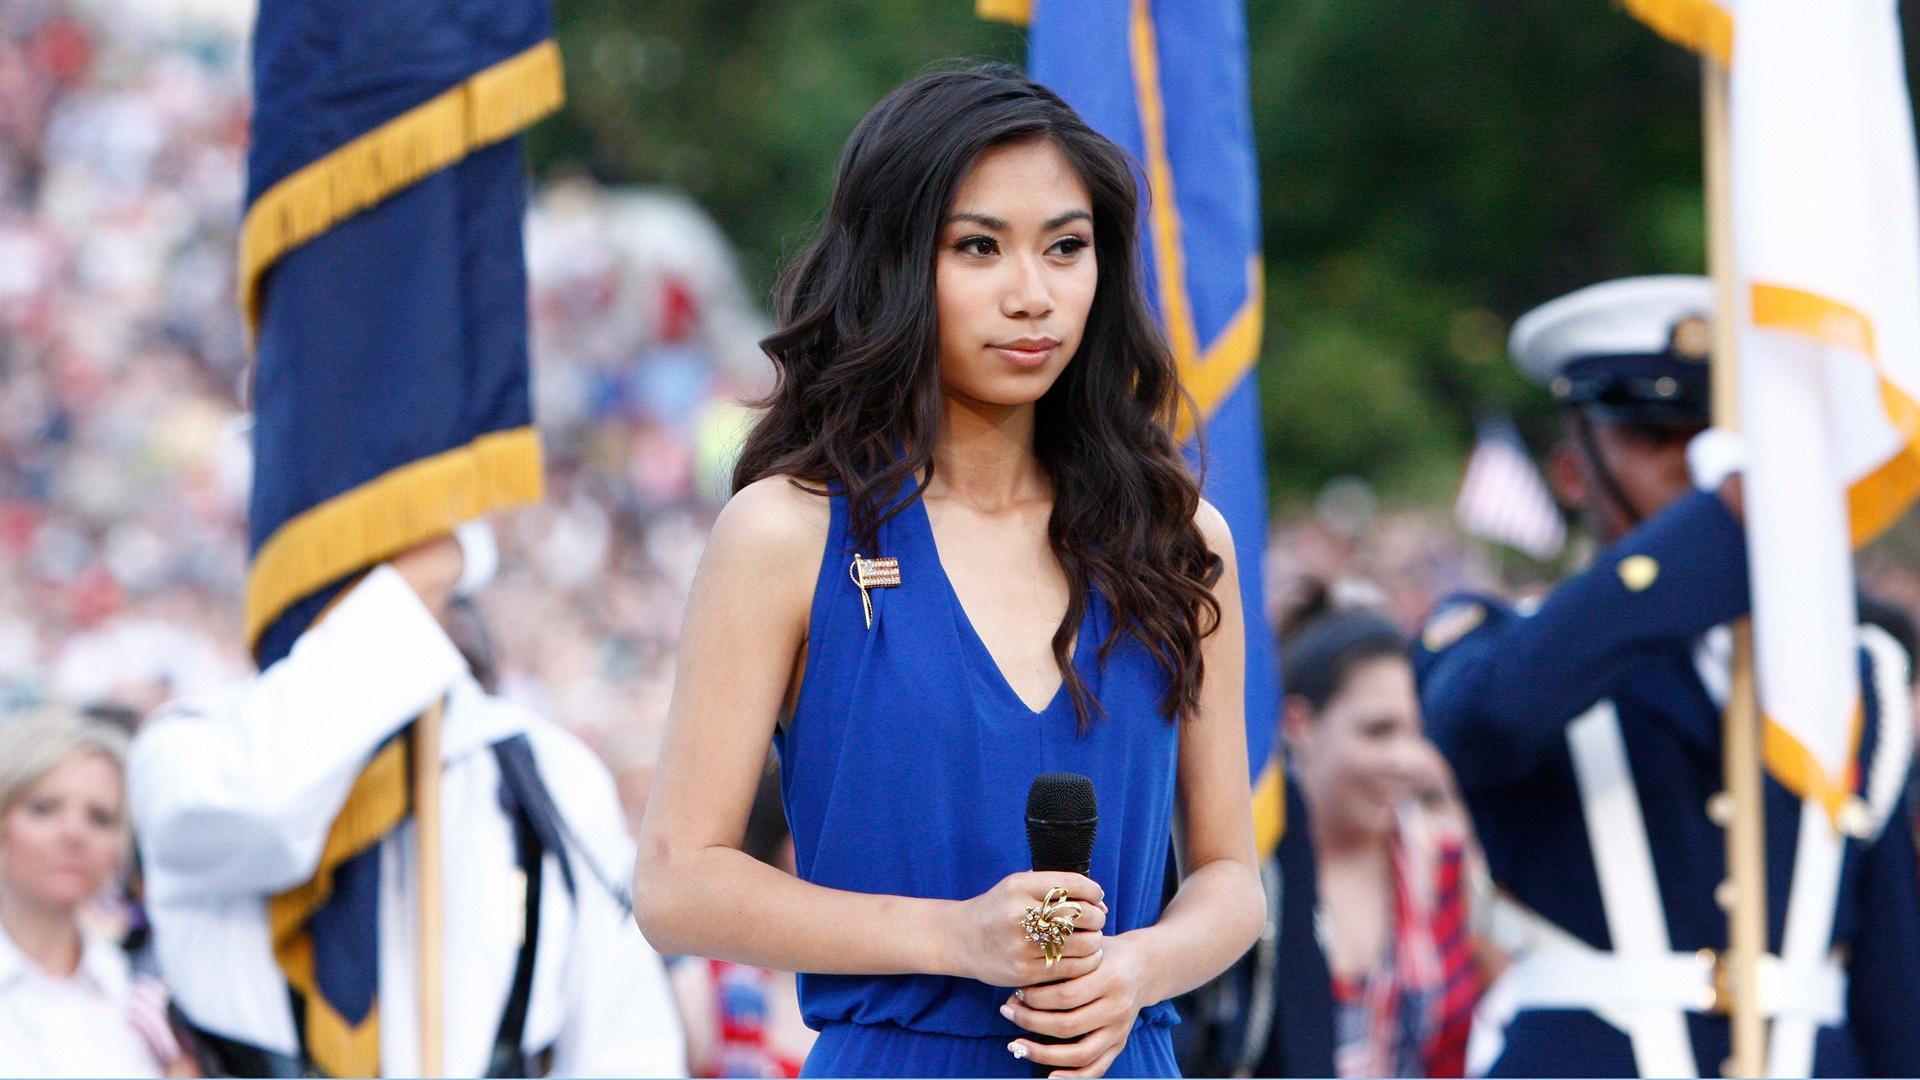 Jessica Sanchez Sings the National Anthem image